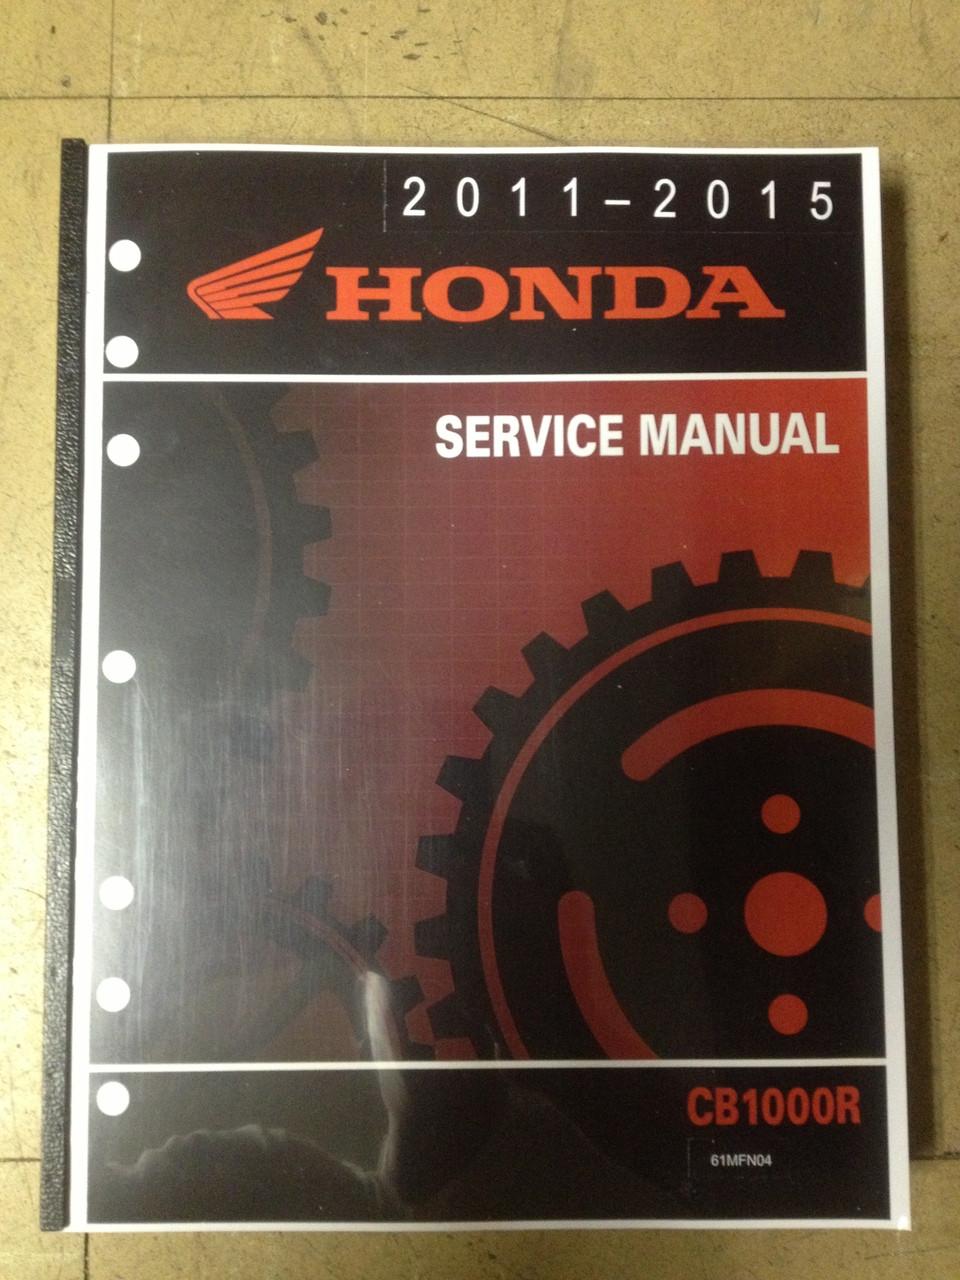 2011 2016 honda cb1000r part 61mfn05 service shop repair manual rh service shop repair manual com honda cb1000r service manual pdf honda cb1000r service manual pdf